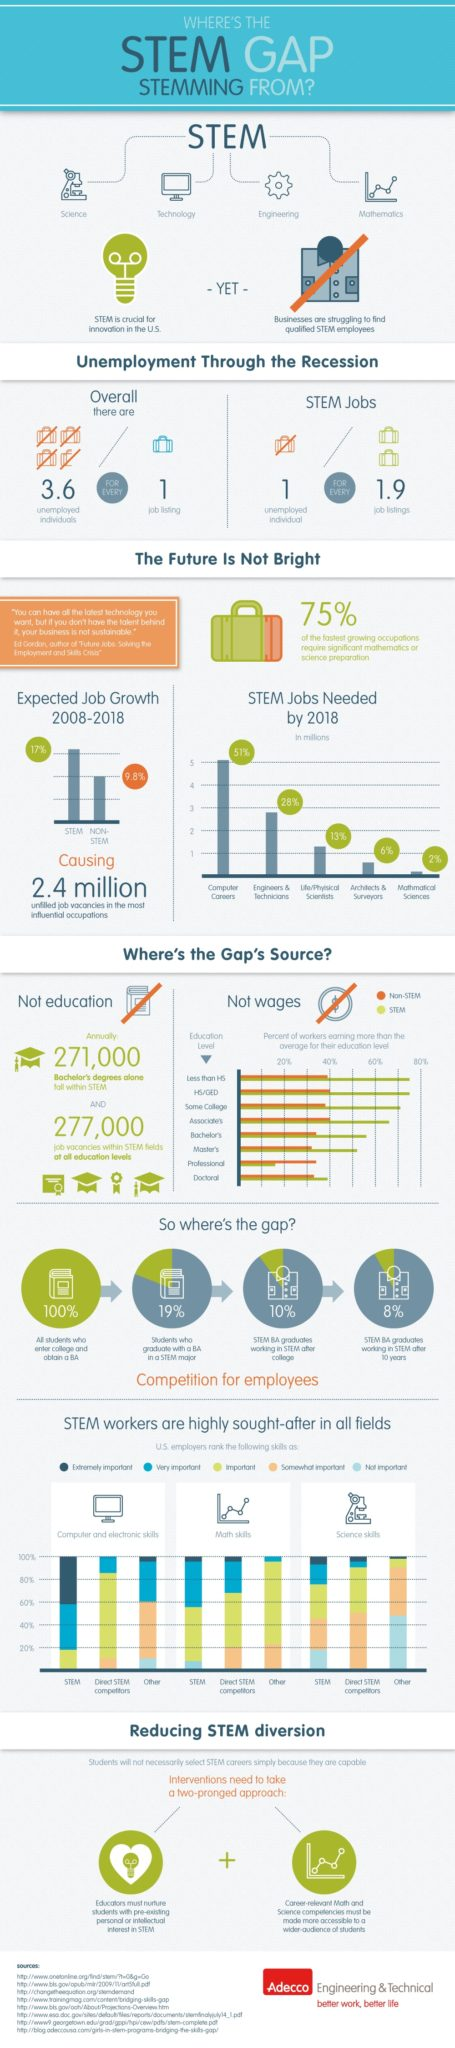 stem-jobs-infographic